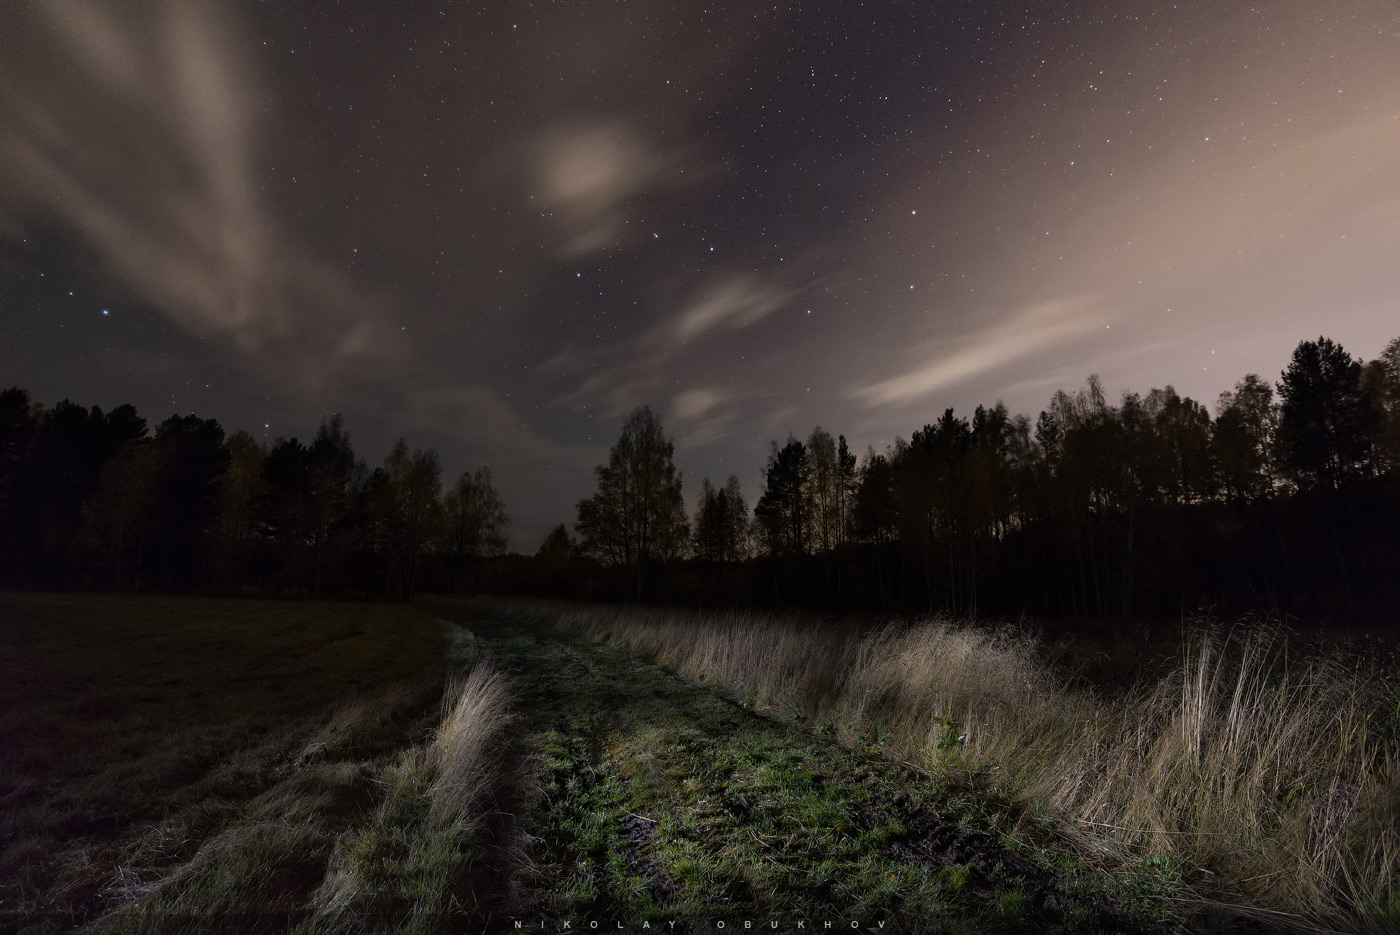 Фото 16. Камера Никон Д610 с объективом Никон 18-35 мм f/3.5-4.5 G. Небо: 18 mm, ISO 3200, f/3.5, 15 s, 8 кадров. Земля: 18 mm, ISO 500, f/8.0, 30 s, 6 кадров с подсветкой. Облака подсвечены световым загрязнением от города (до него меньше 20 км).